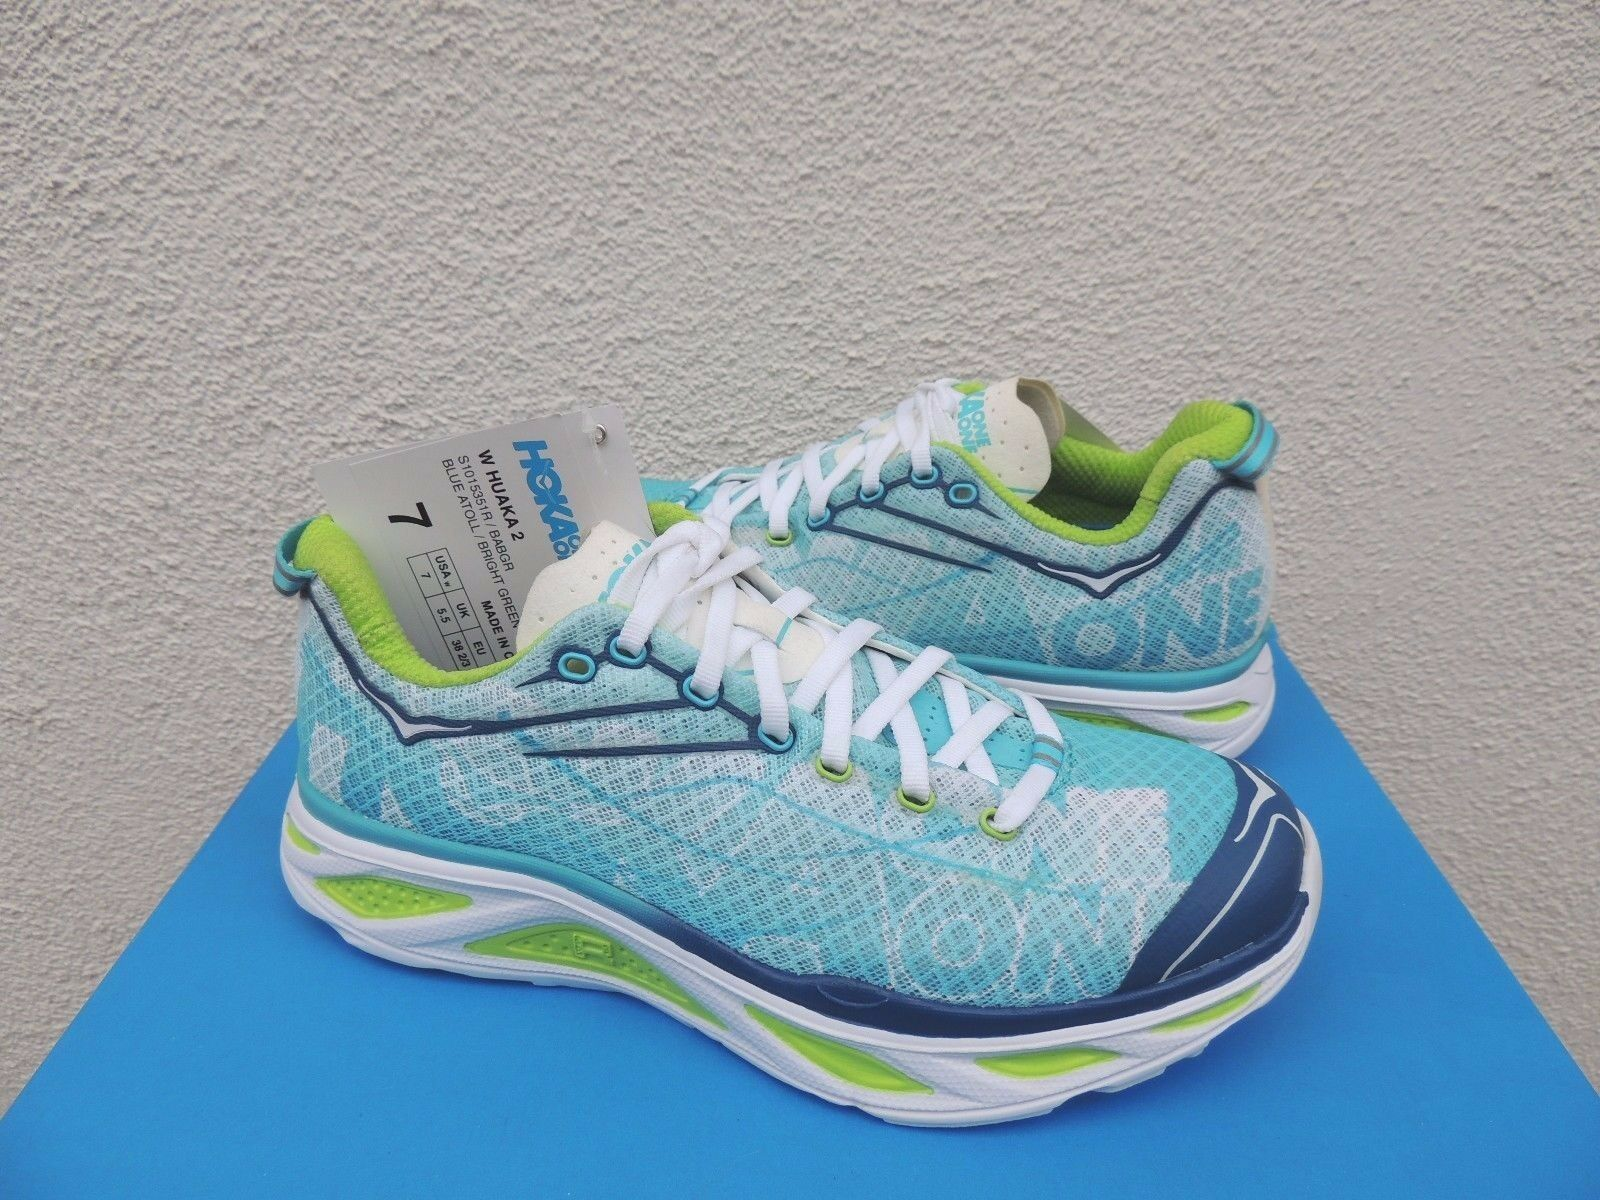 Hoka One One huaka 2 Azul atolón verde Trail Trail Trail Running Zapatos, EE. UU. 7 38 2 3 euros nuevo  bienvenido a elegir